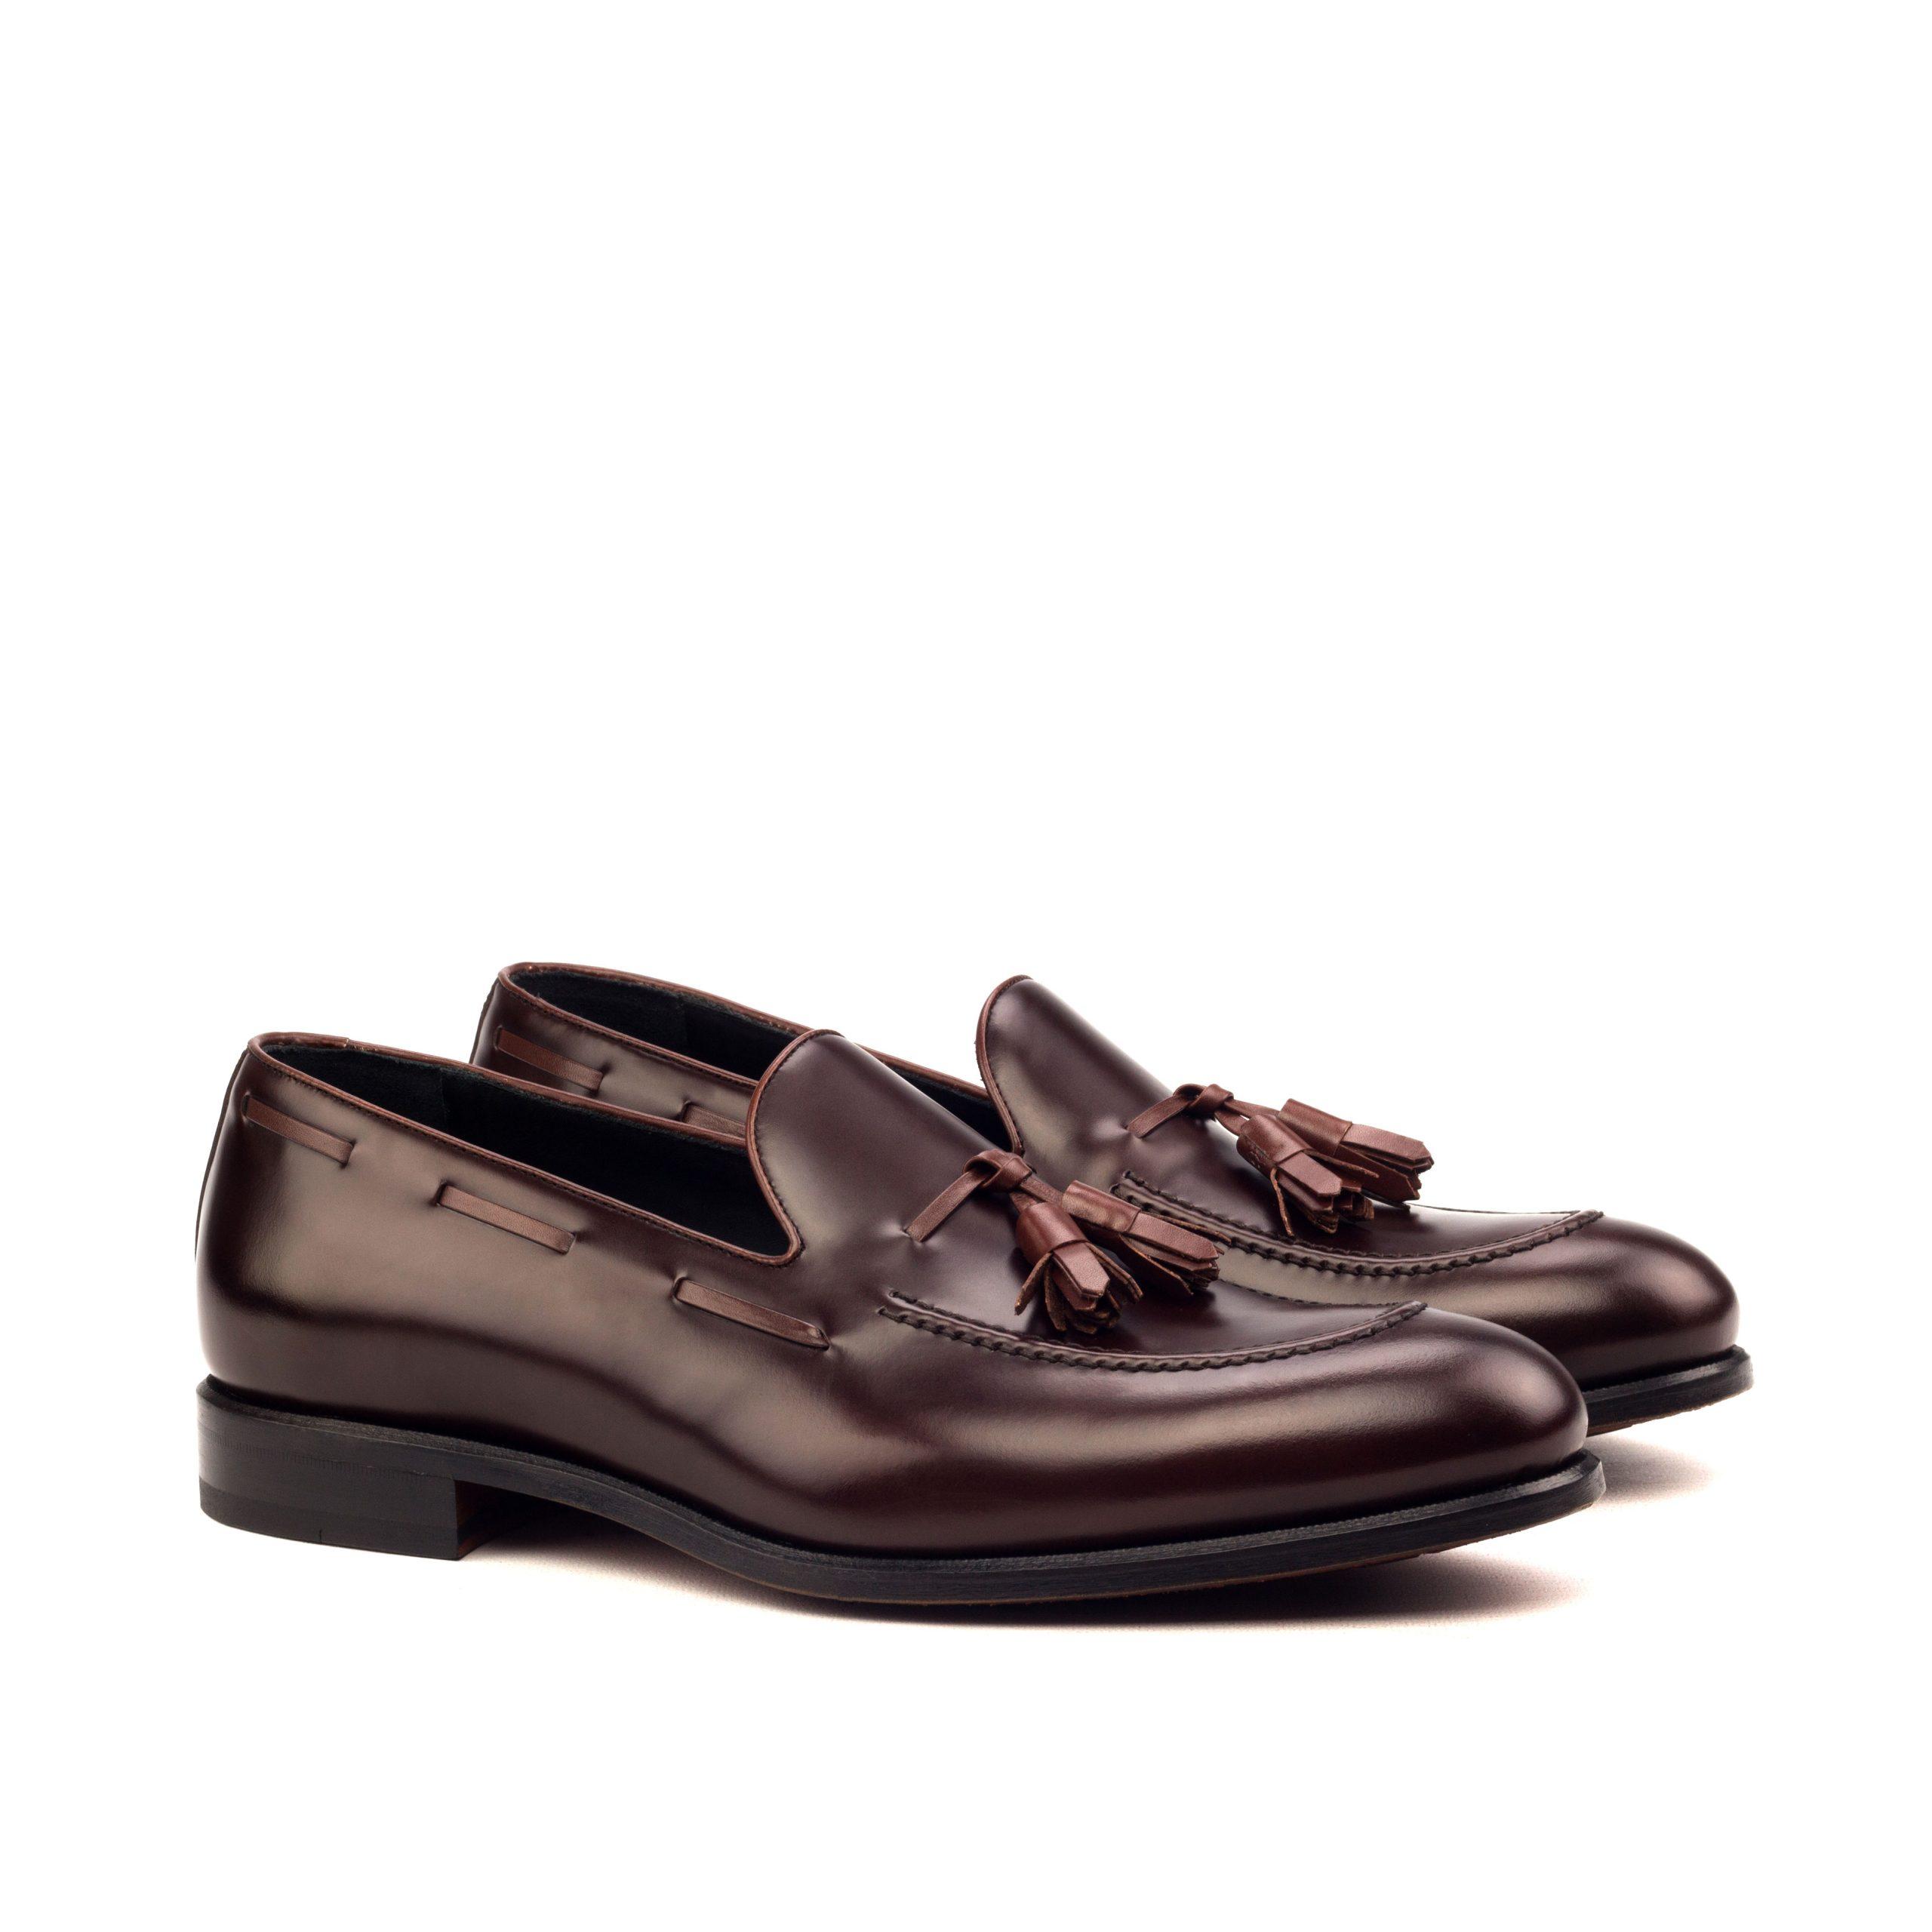 Loafer Tassels - Polished Calf Brown-Box Calf Med Brown-Ang5